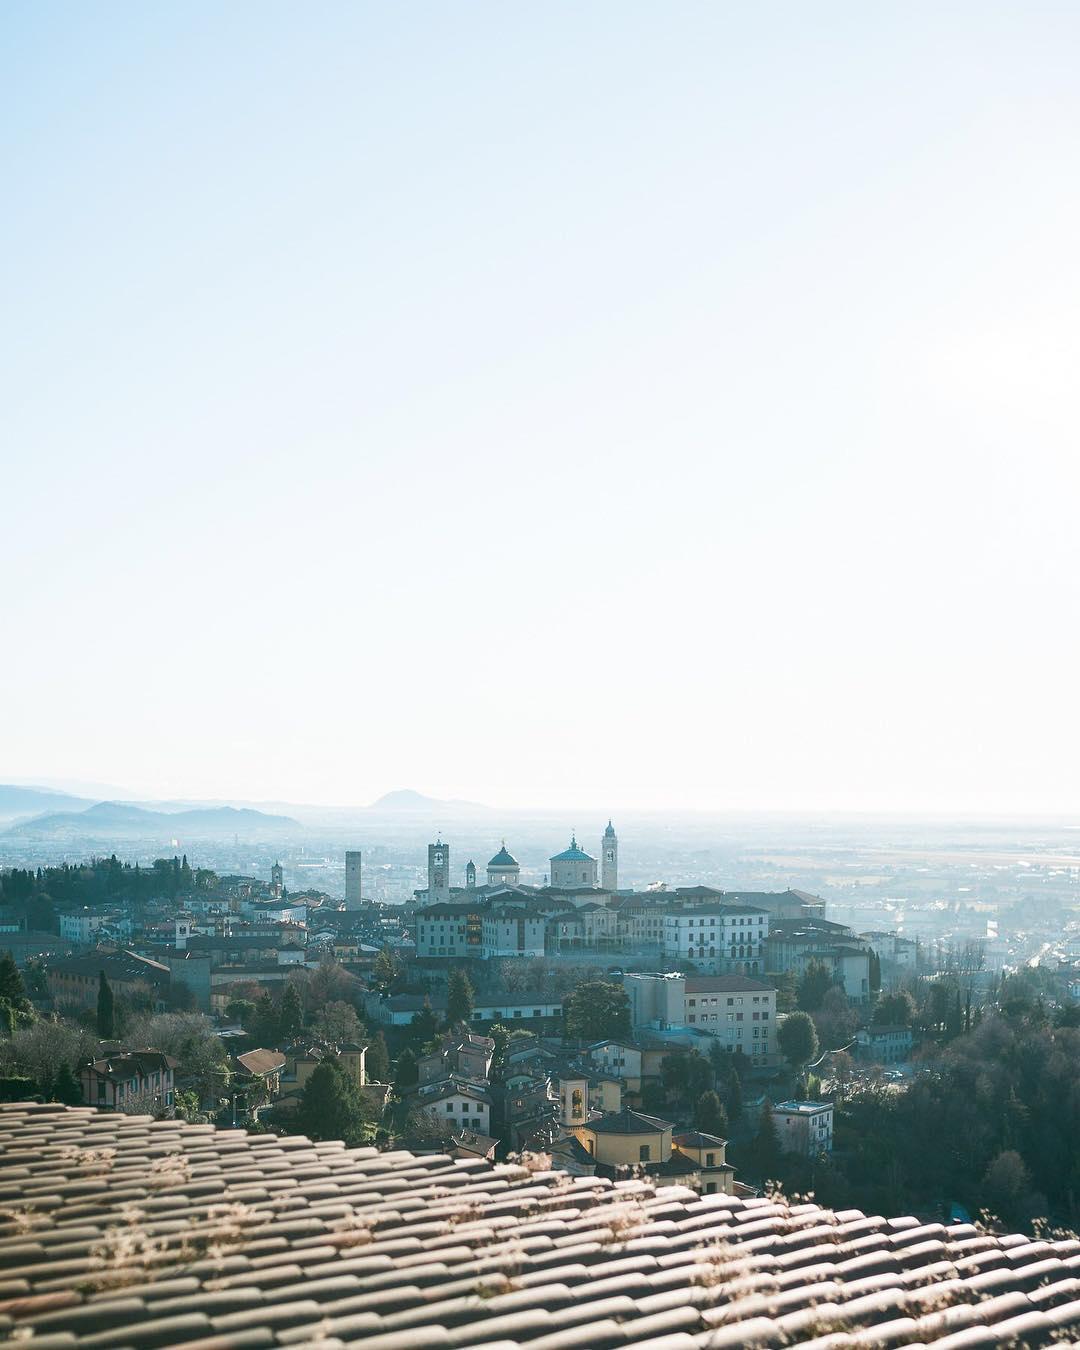 Bergamo, Italy (Image by Luca Giupponi)